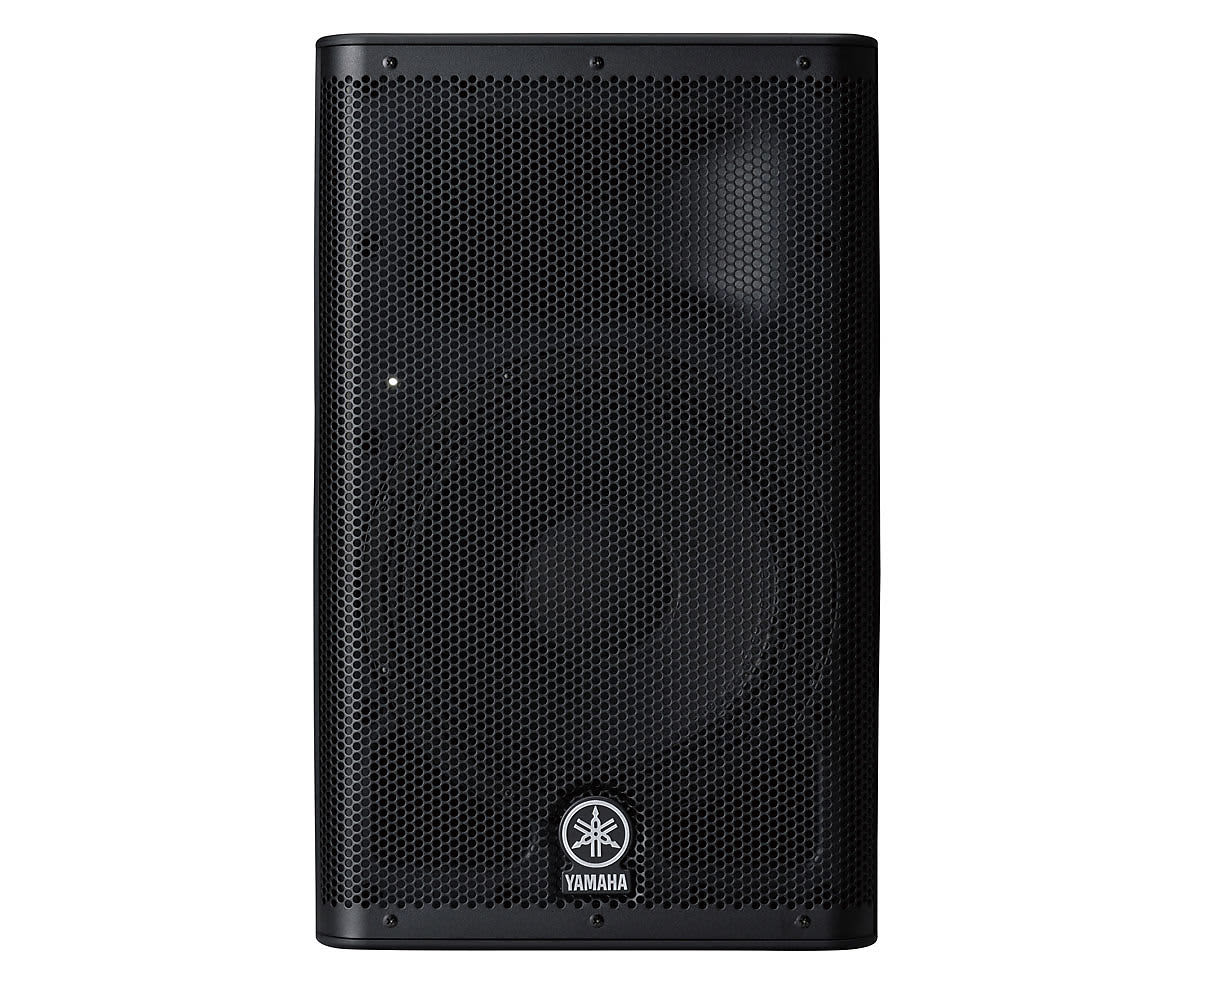 Yamaha dxr8 proaudiostar reverb for Yamaha dxs12 specs